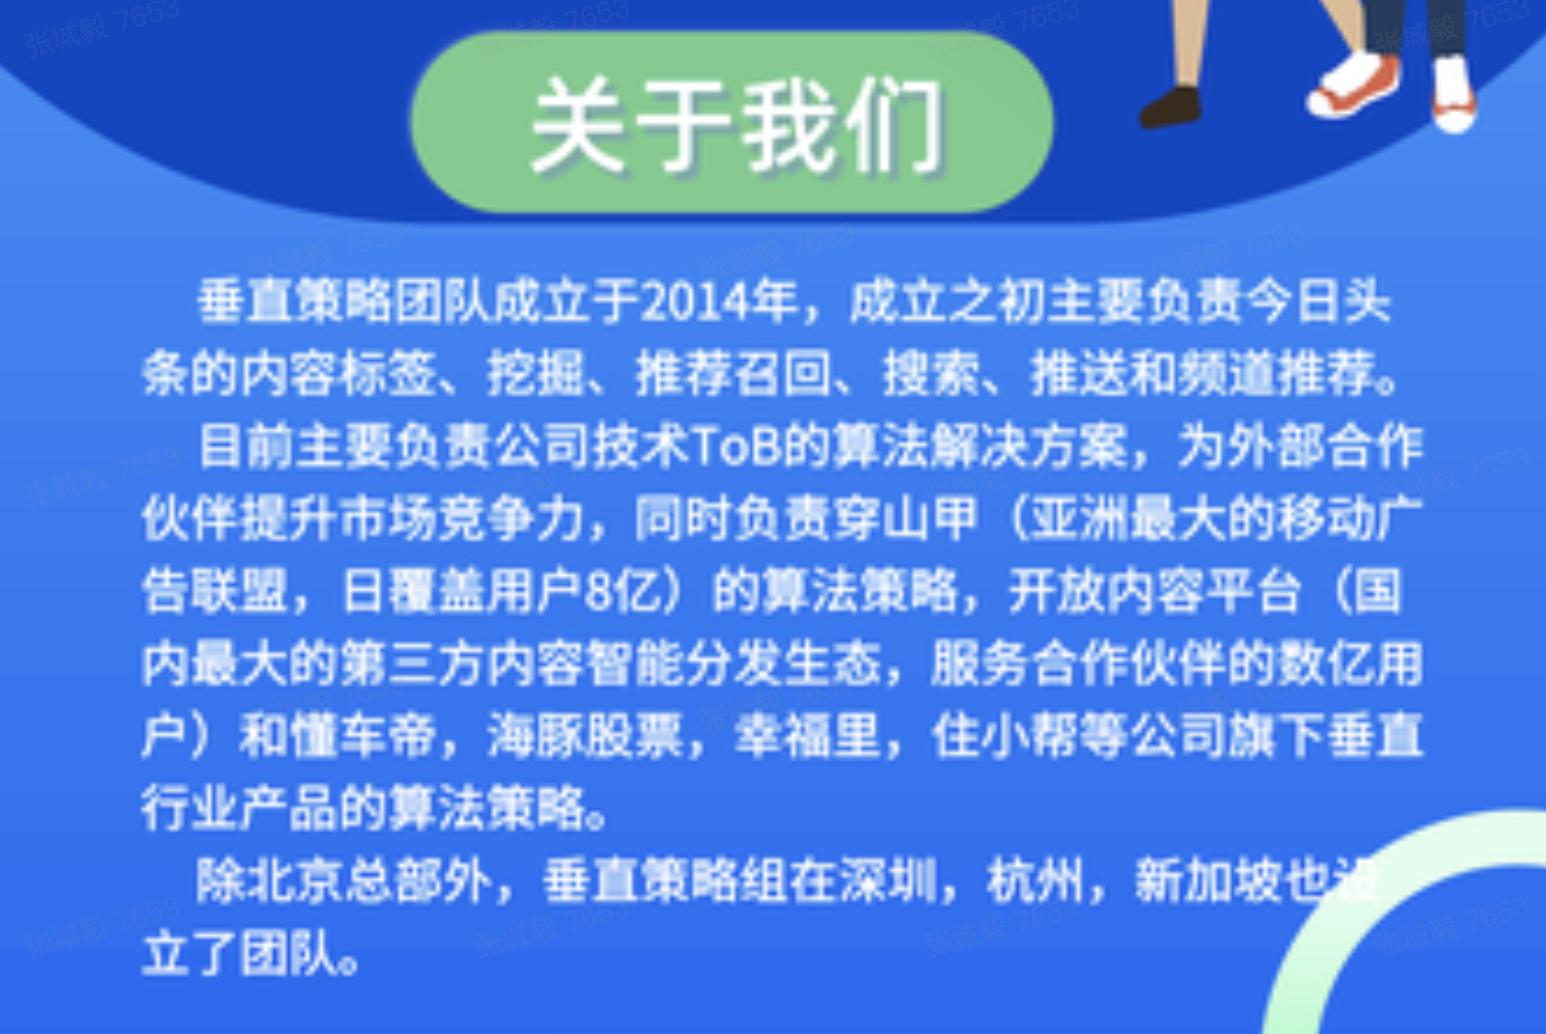 内推部门介绍.png